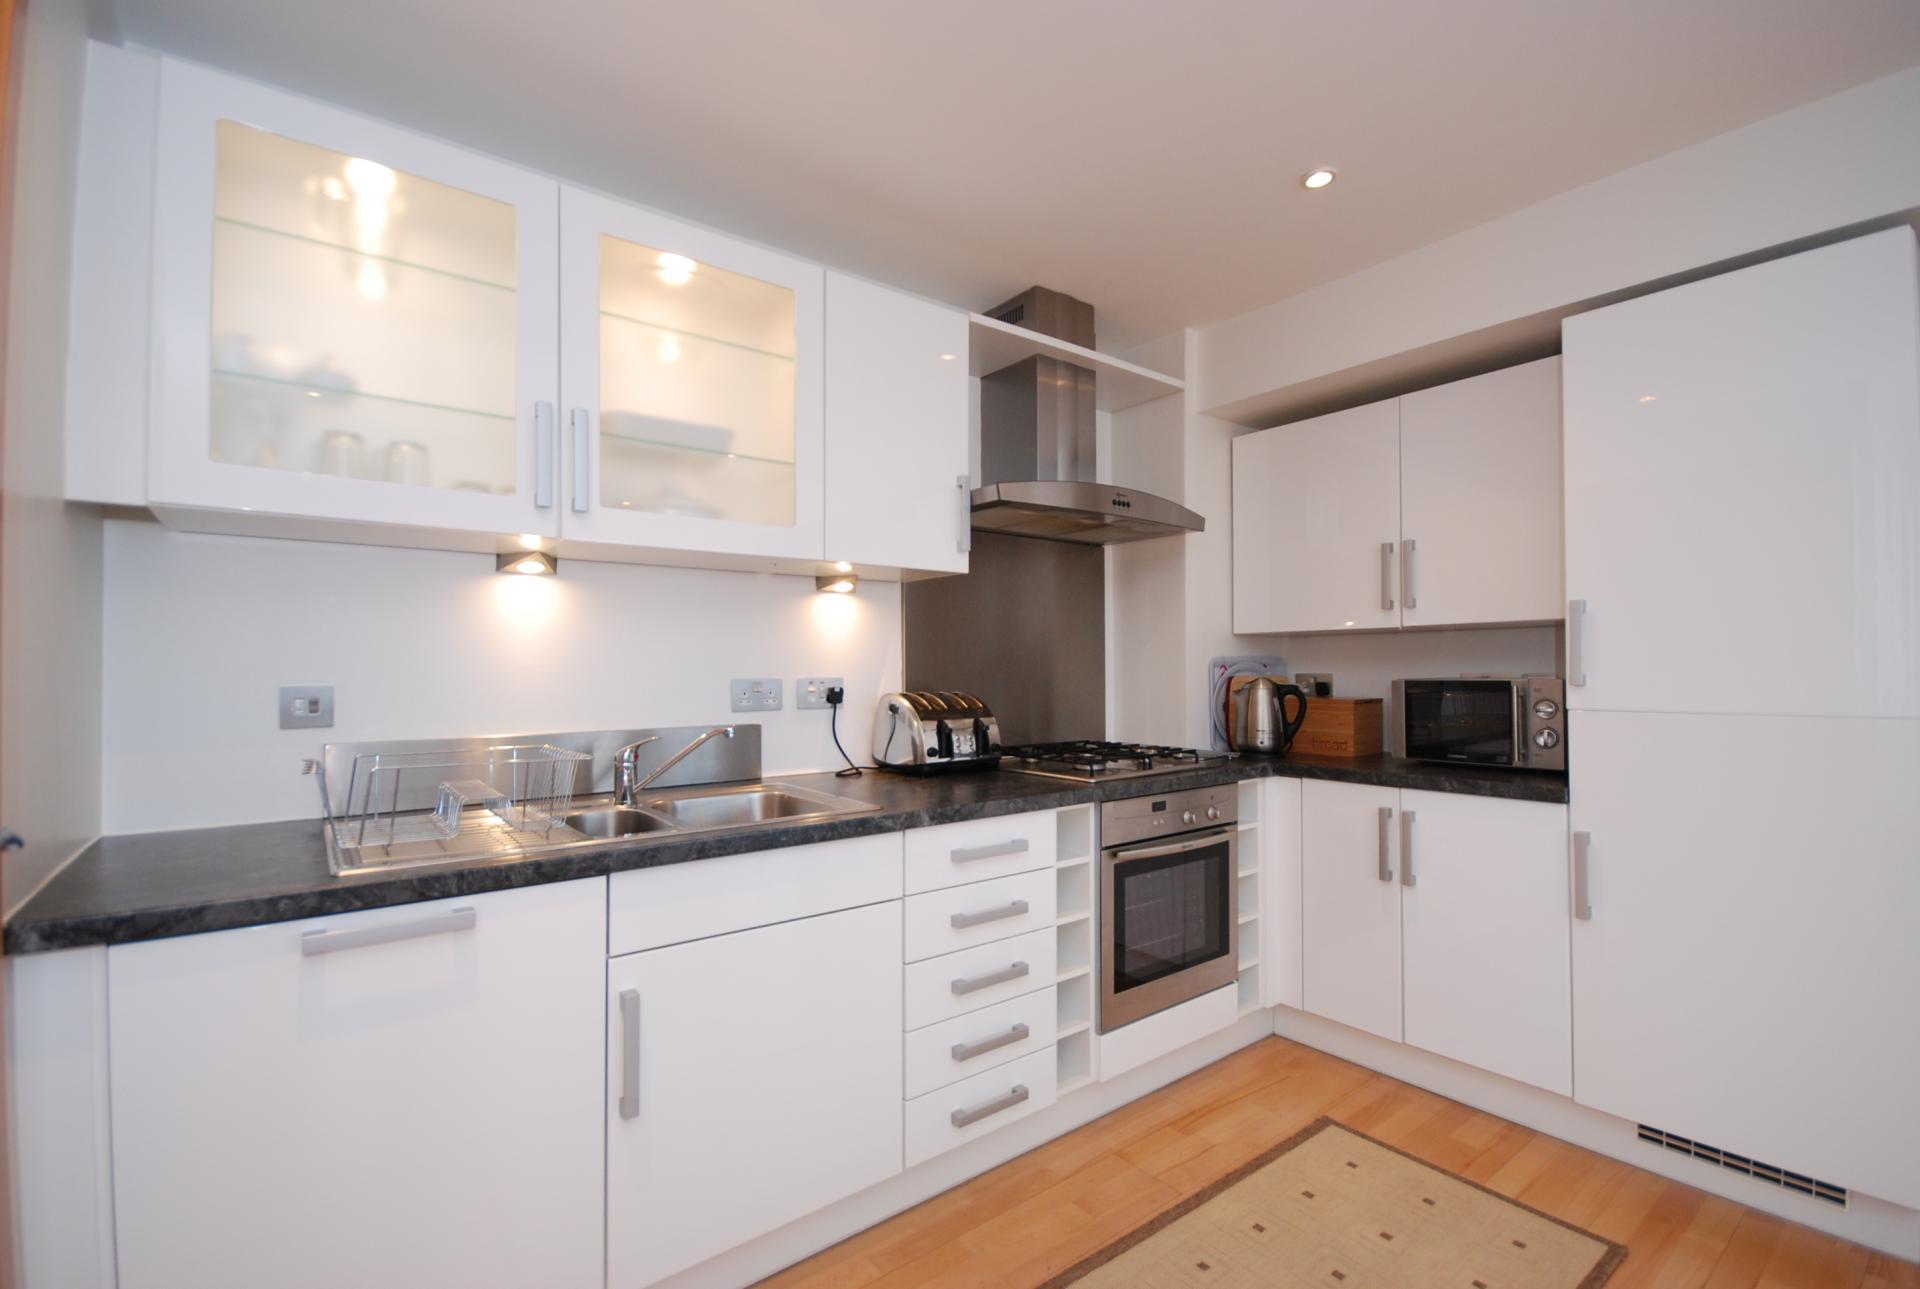 Kitchen at Barony High Apartment